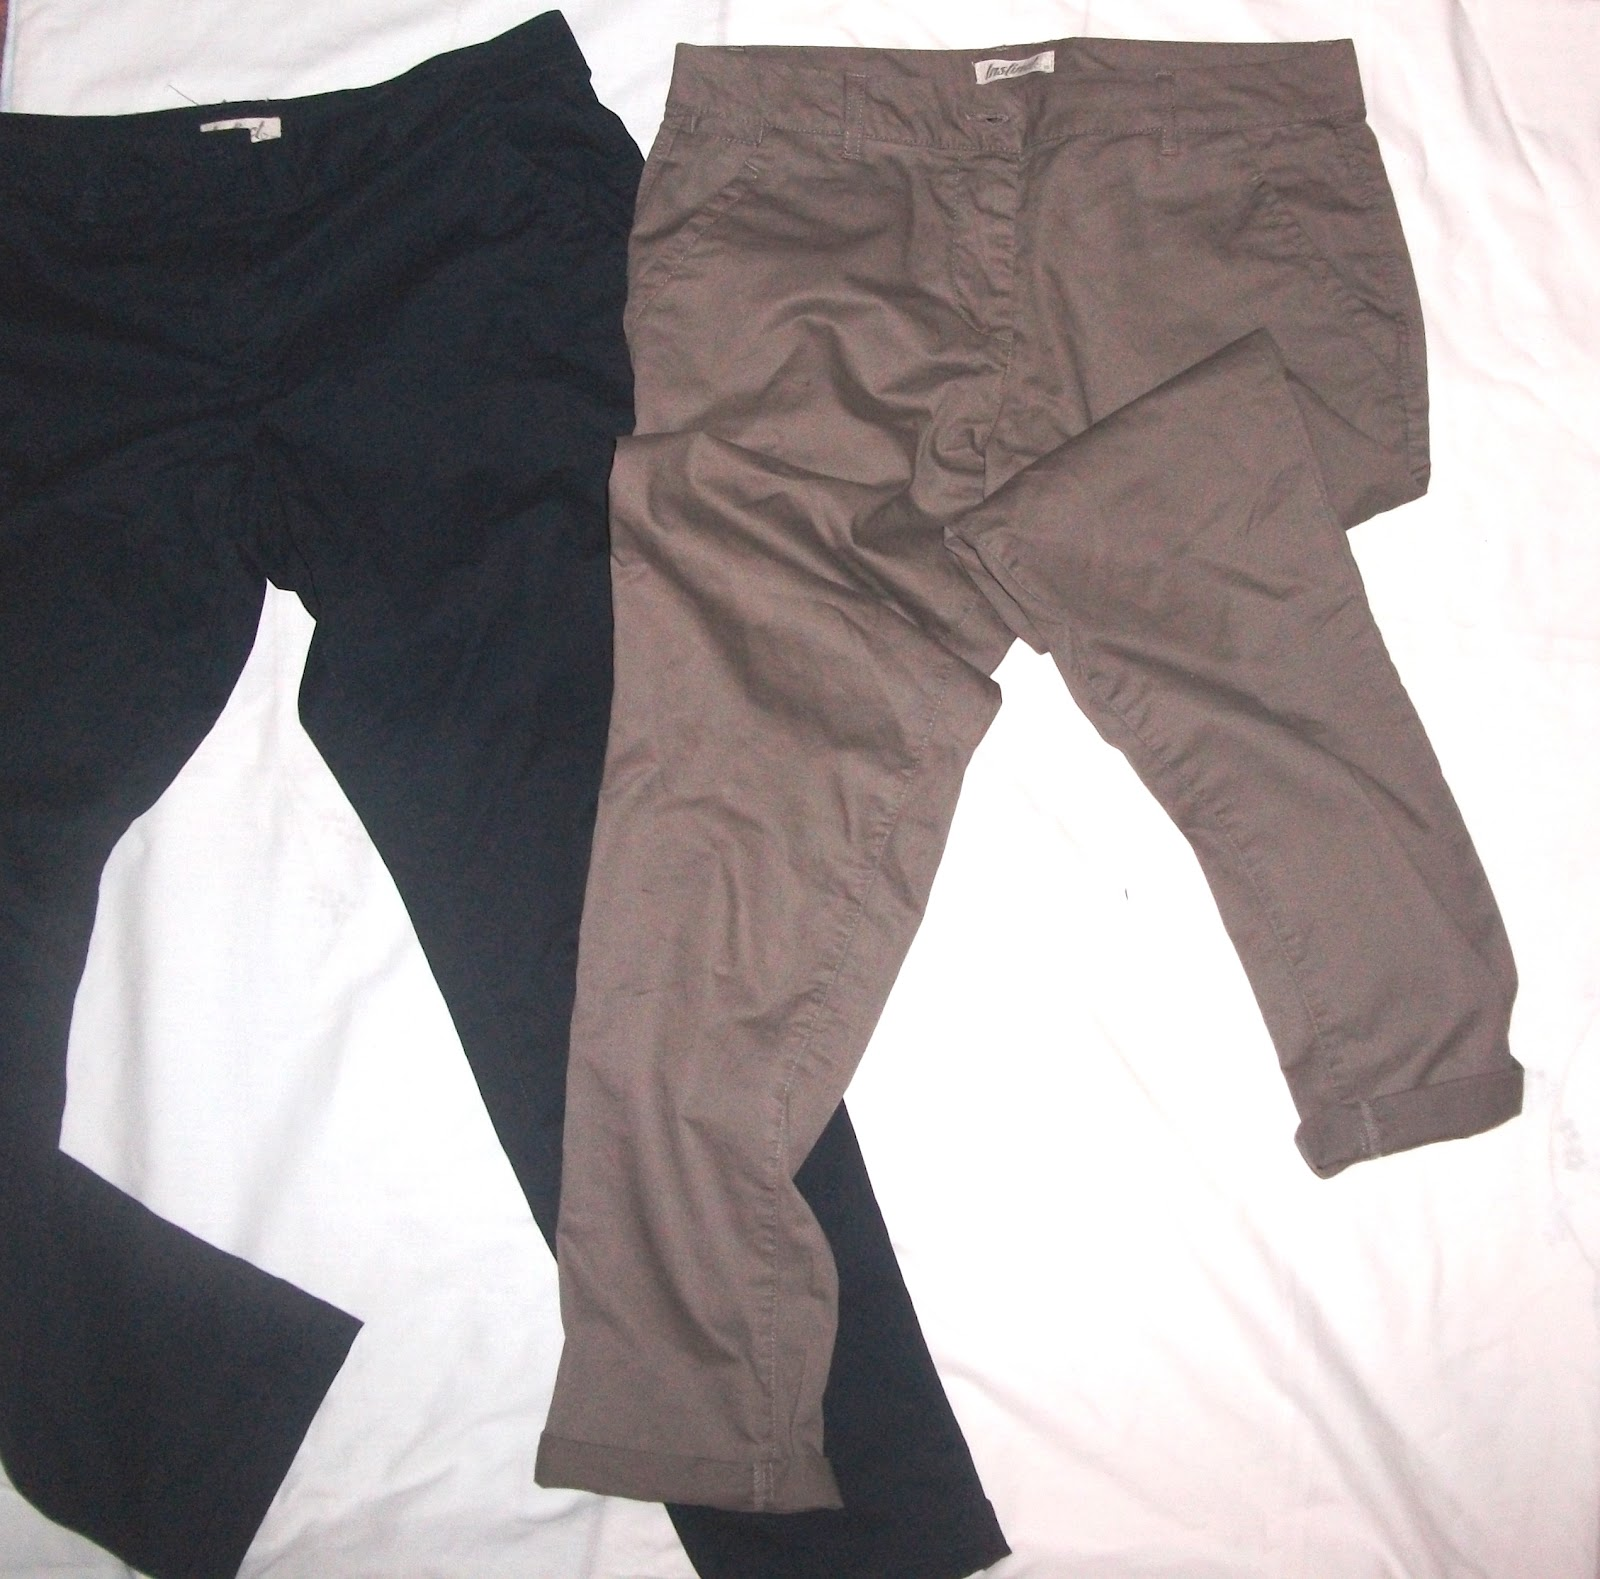 http://1.bp.blogspot.com/-AJauXYWwhkY/T-g_zaUMtNI/AAAAAAAAASQ/A0kXpoR8YT0/s1600/Instinct+pants.JPG